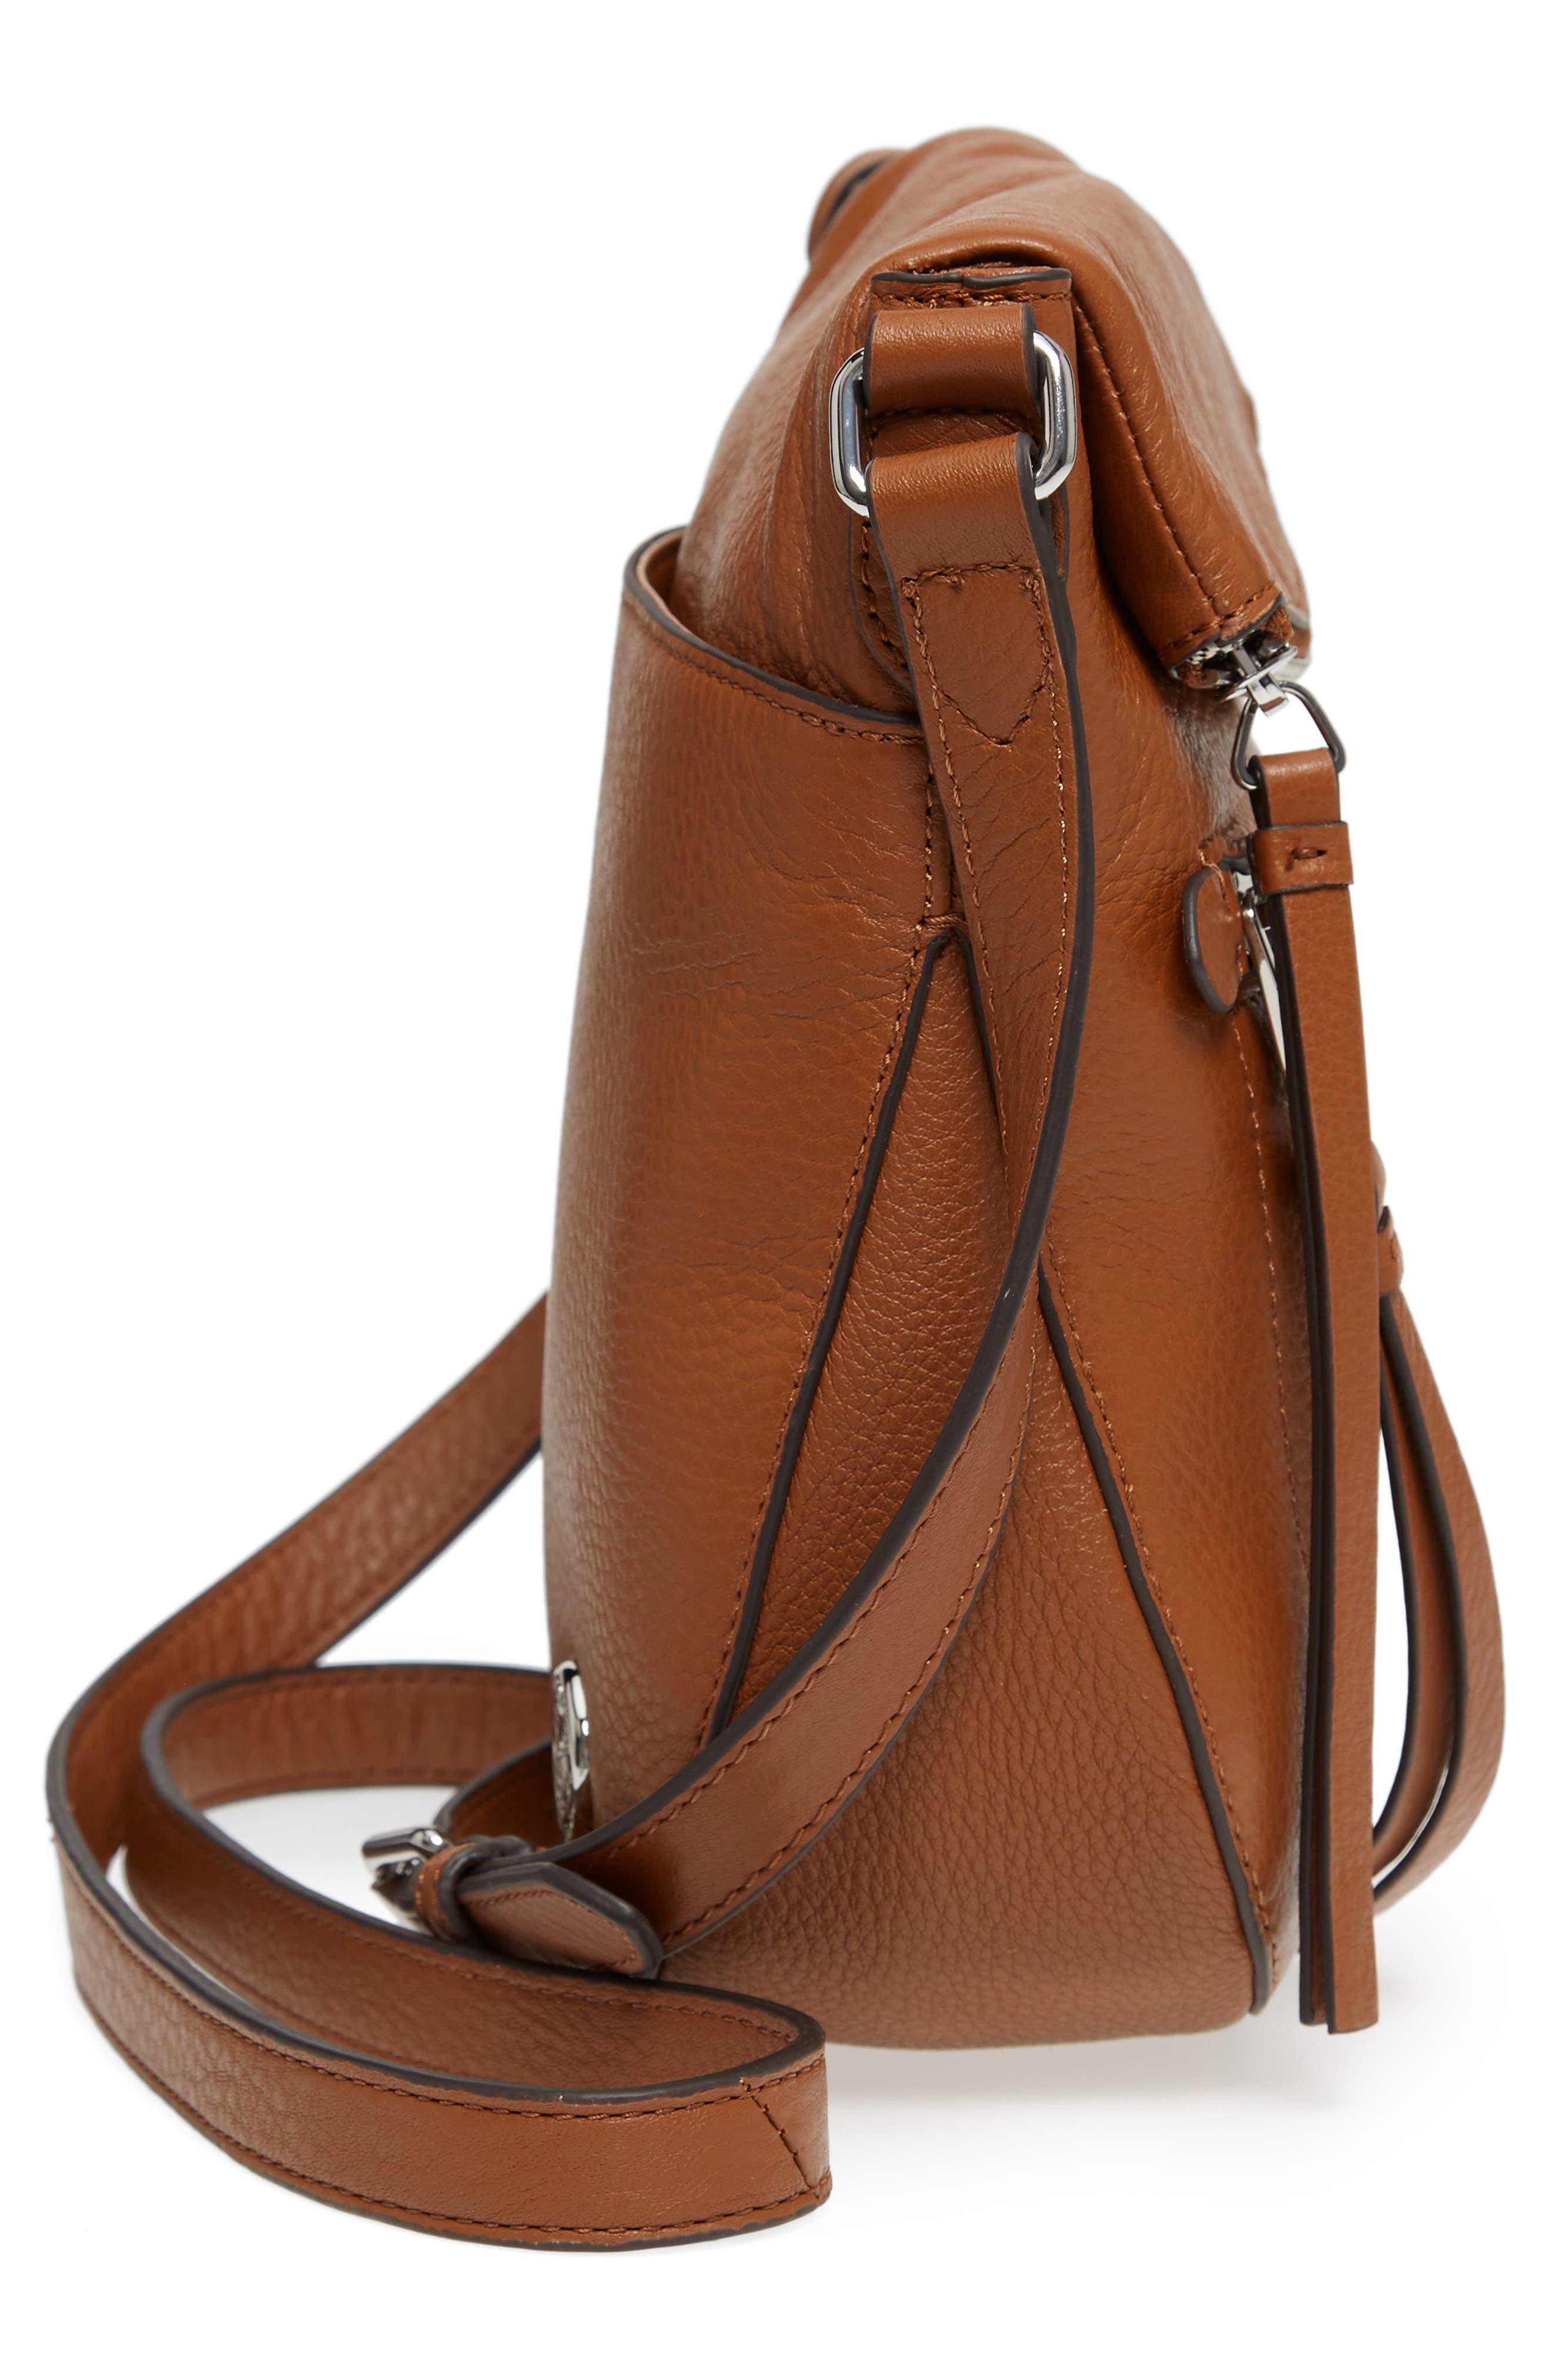 'Tala' Leather Crossbody Bag,                             Alternate thumbnail 5, color,                             203